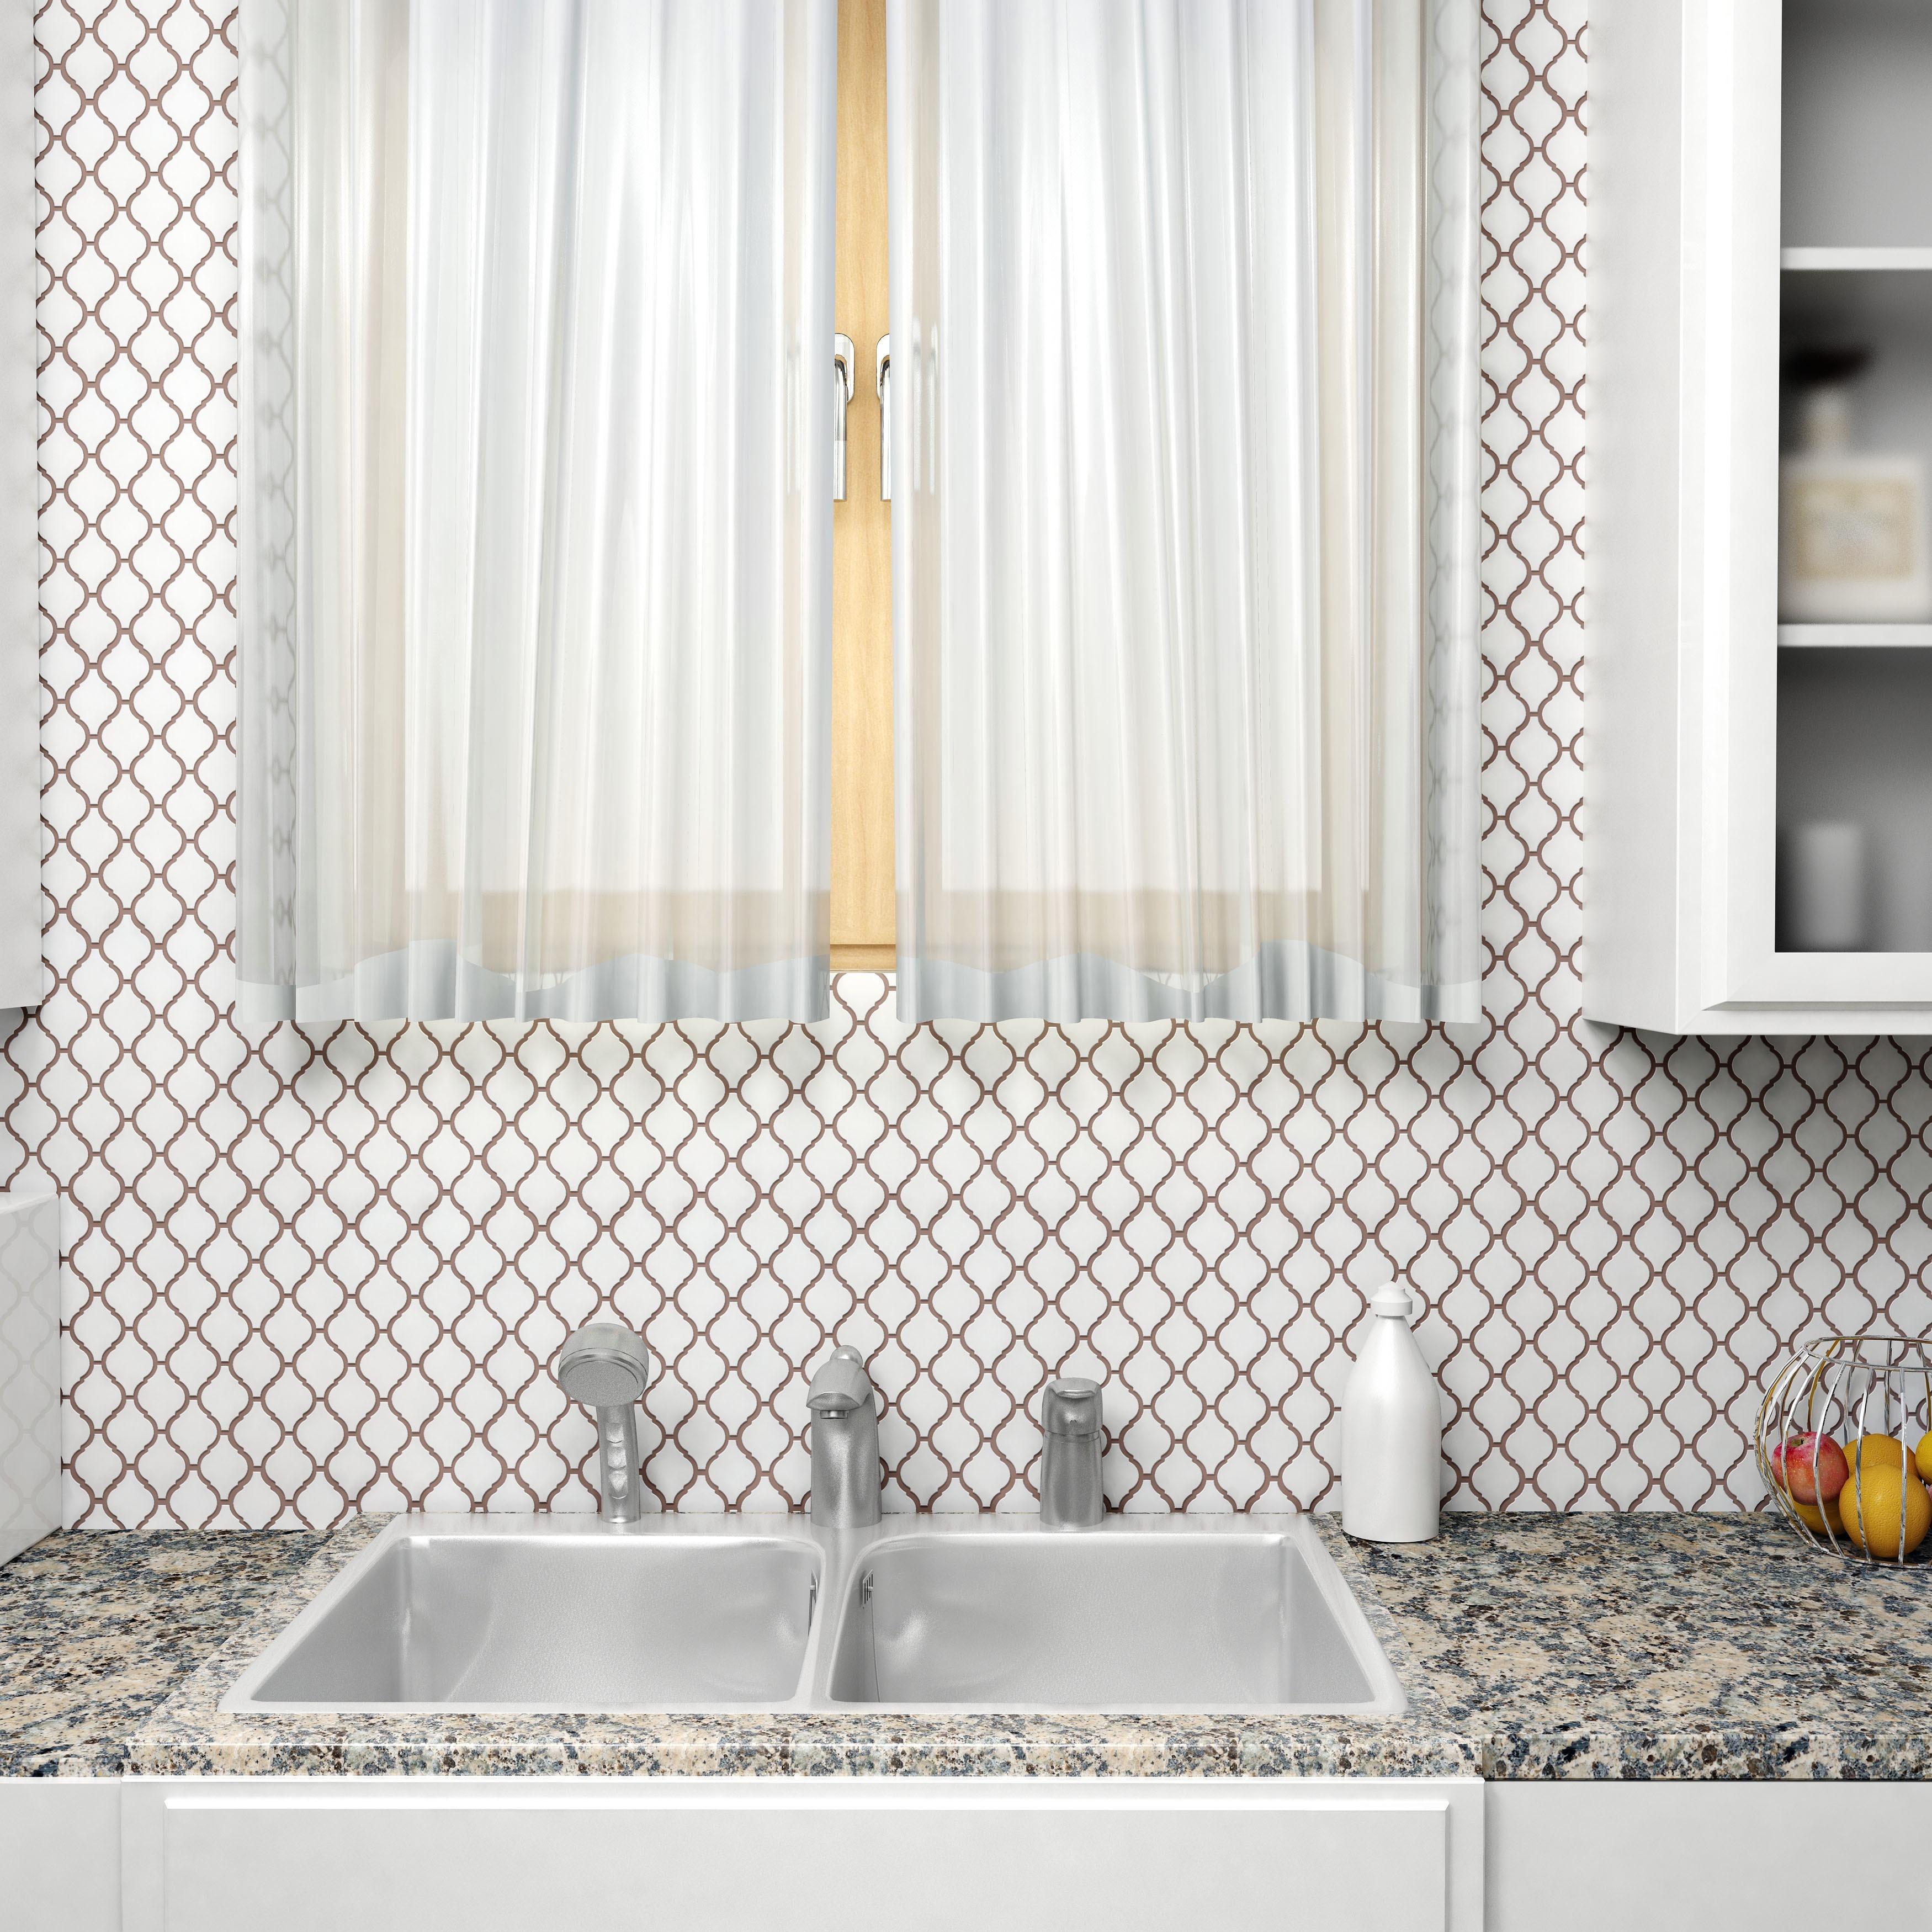 Shop SomerTile 9.875x11.125-inch Casablanca Matte White Porcelain ...